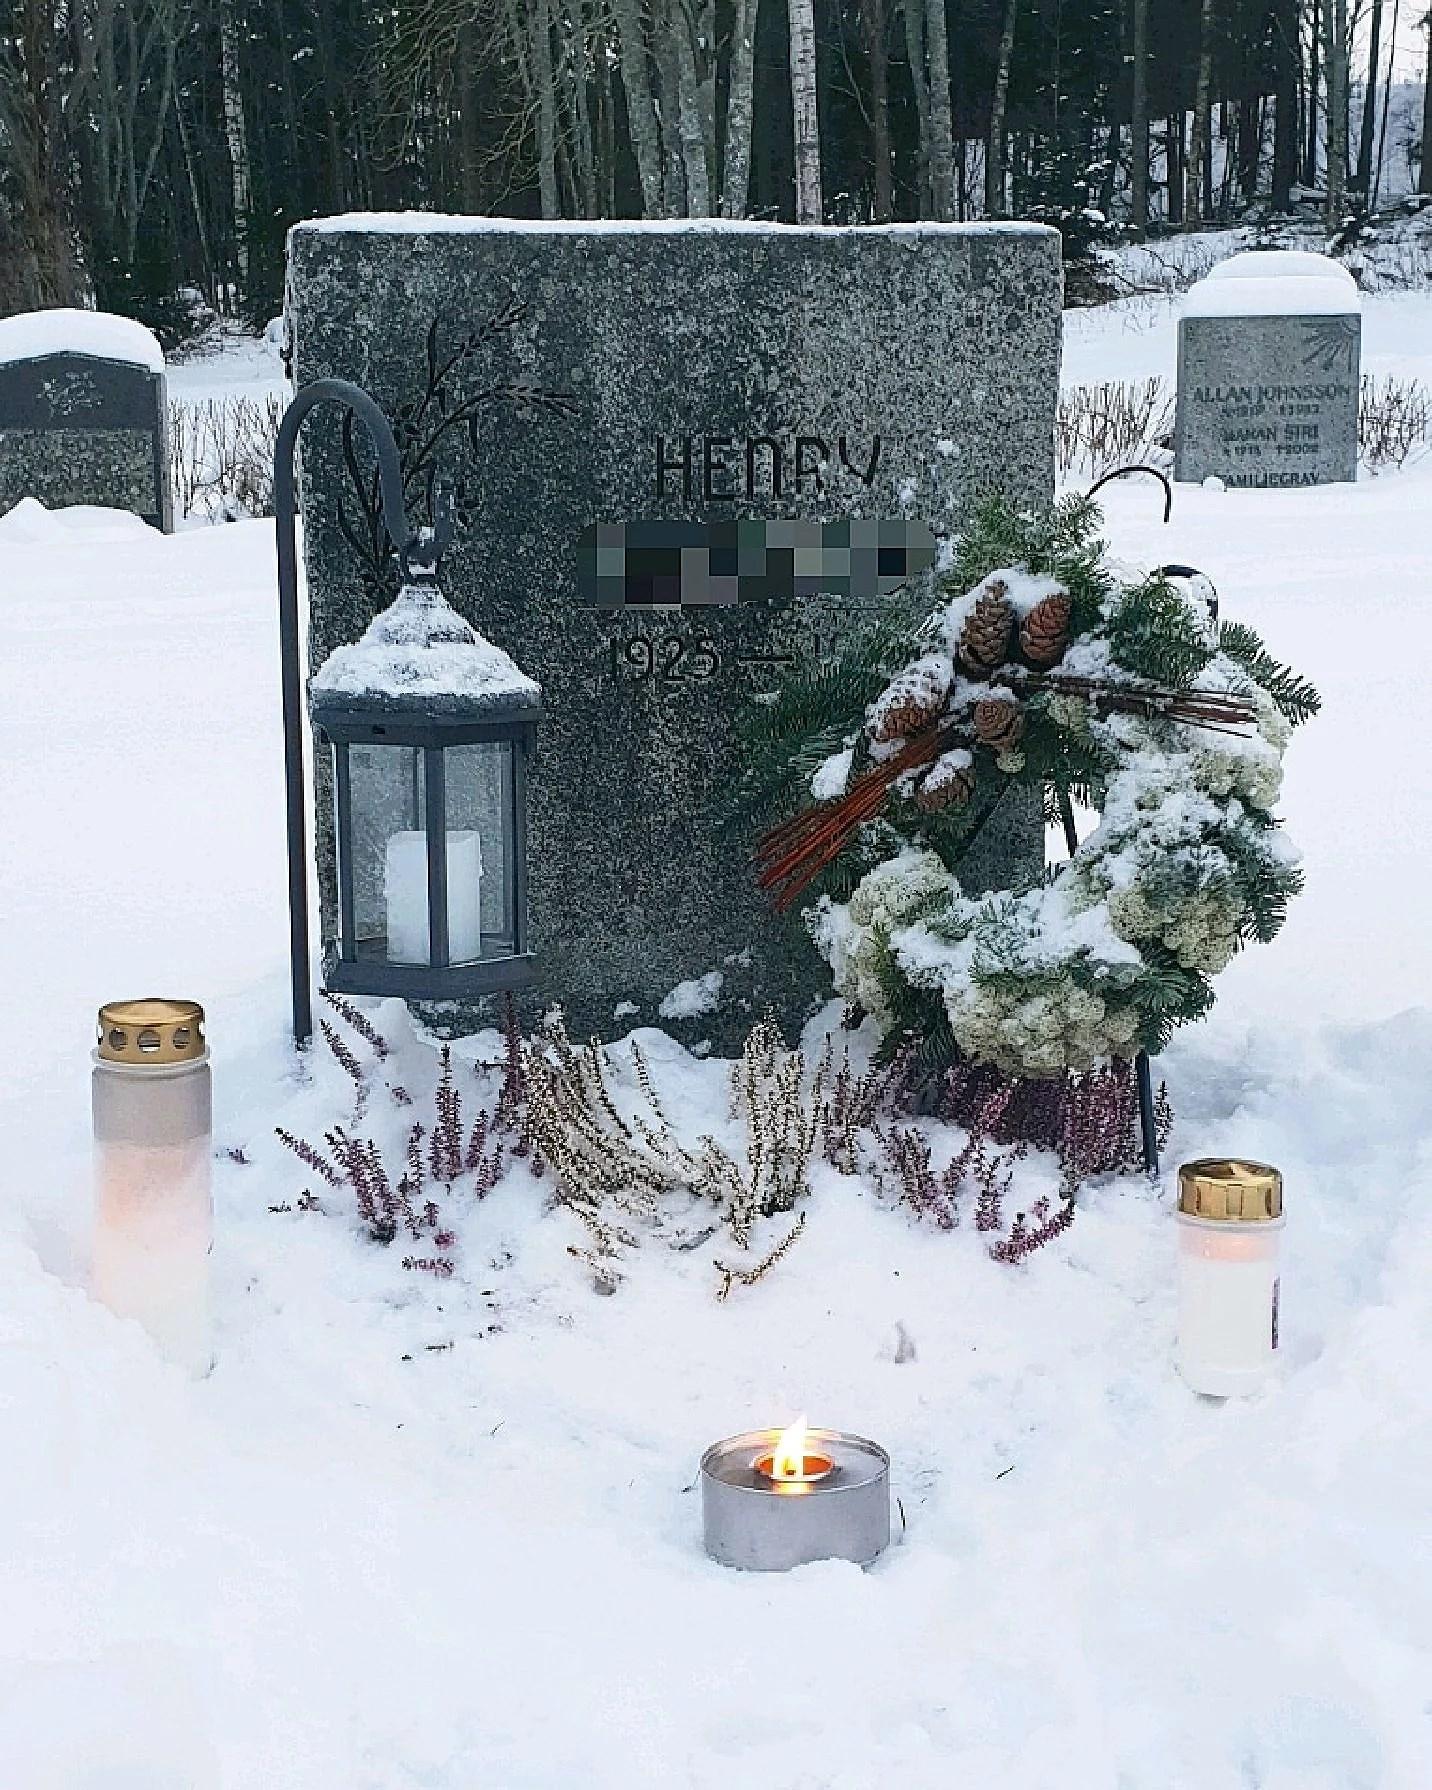 Tända ljus